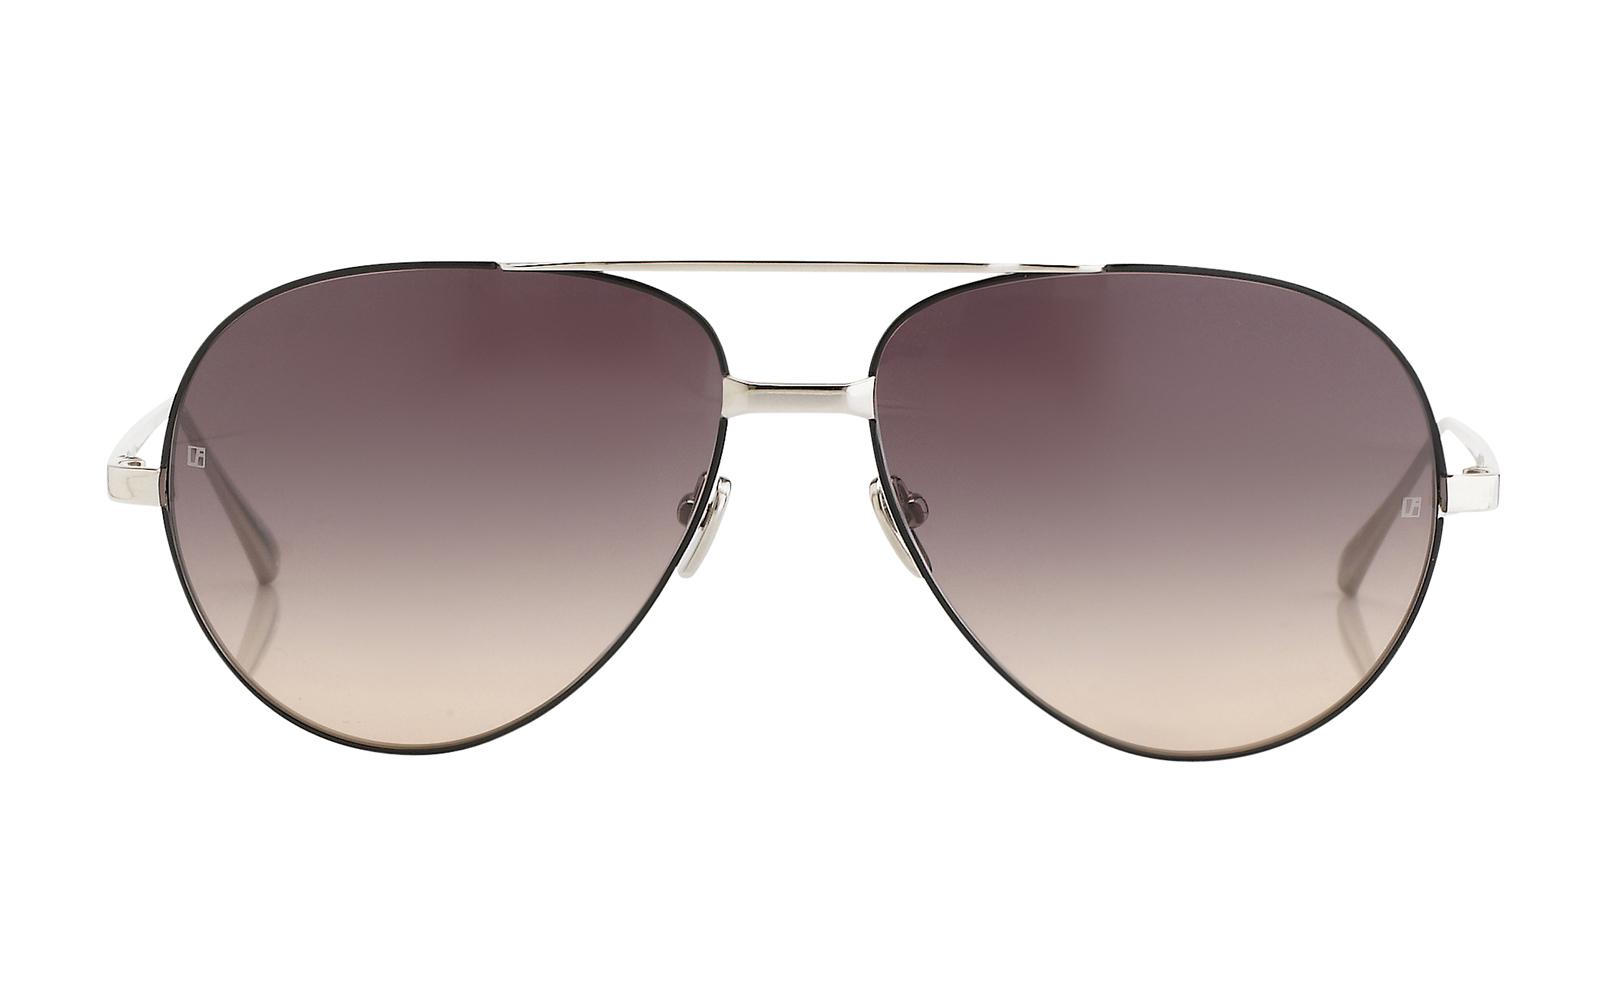 best aviator sunglasses  10 Best Aviator Sunglasses For Any Season: Linda Farrow Luxe ...